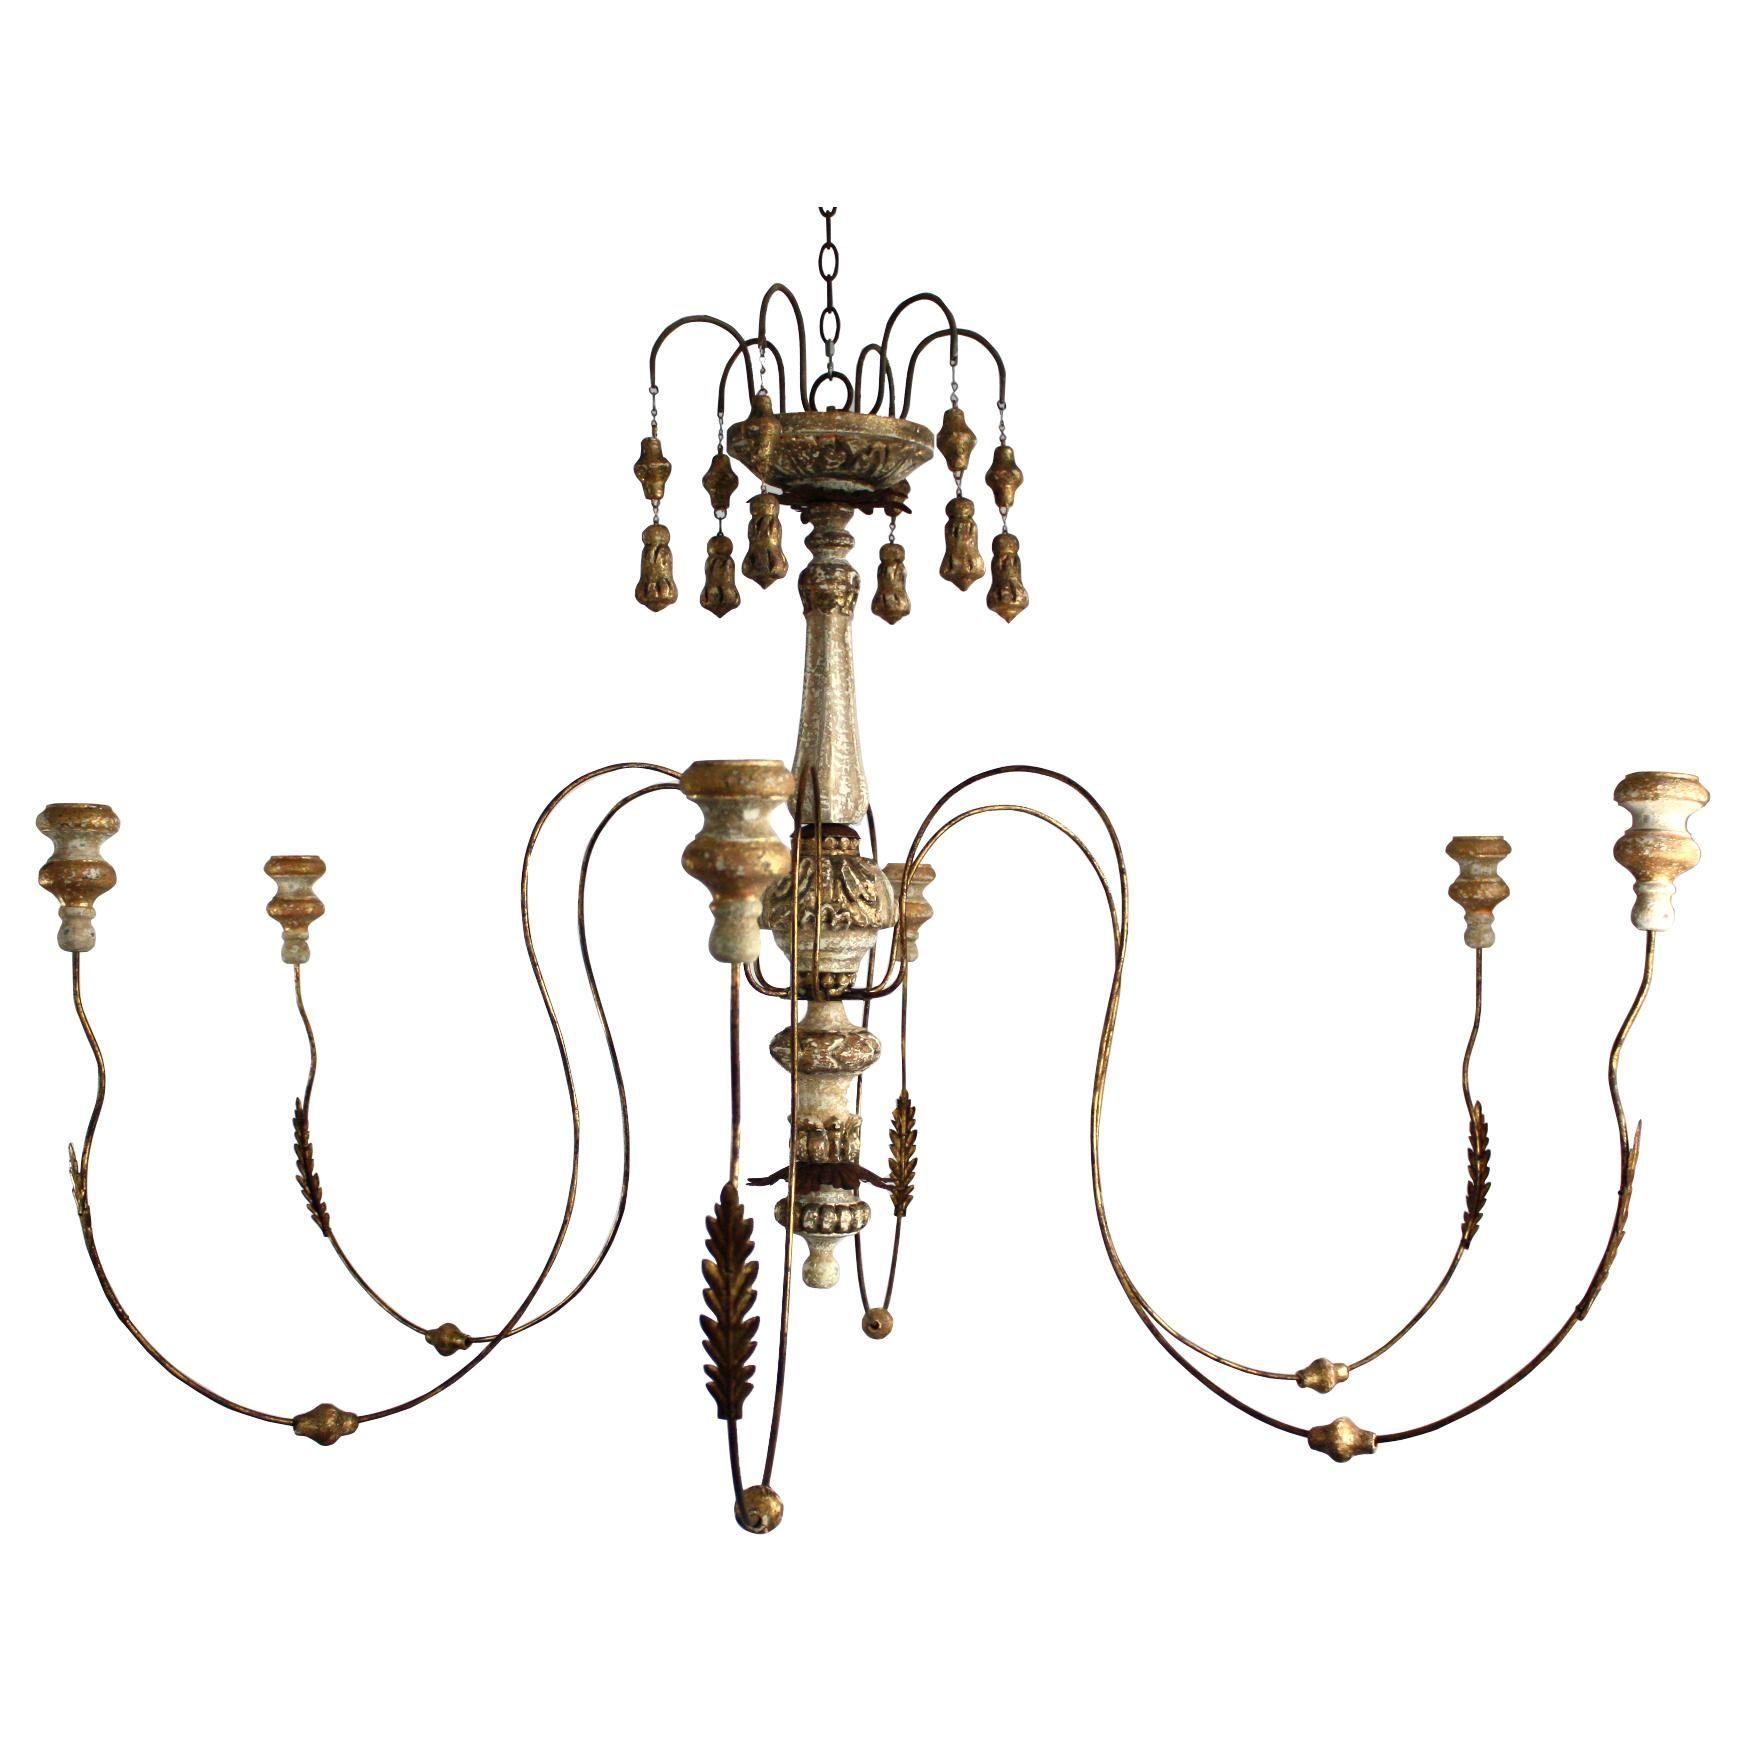 Living room light Italian Wedding Candle Chandelier